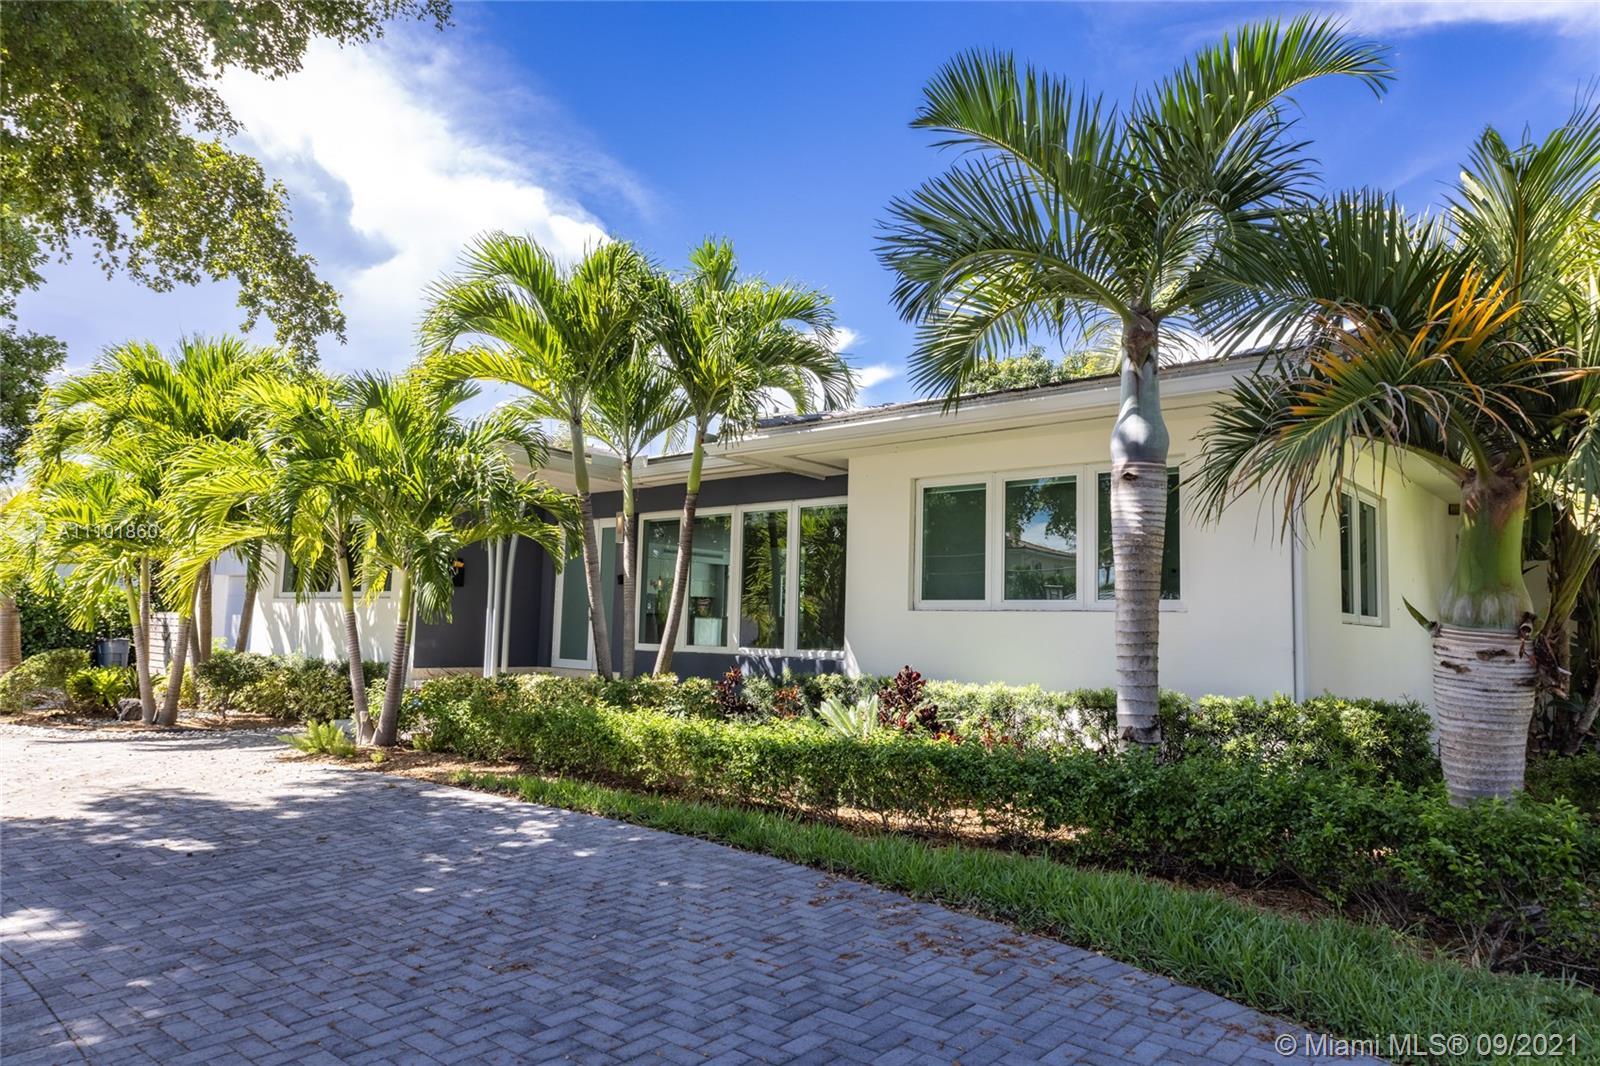 Single Family Home For Sale M SHORES BAY PK ESTATES2,370 Sqft